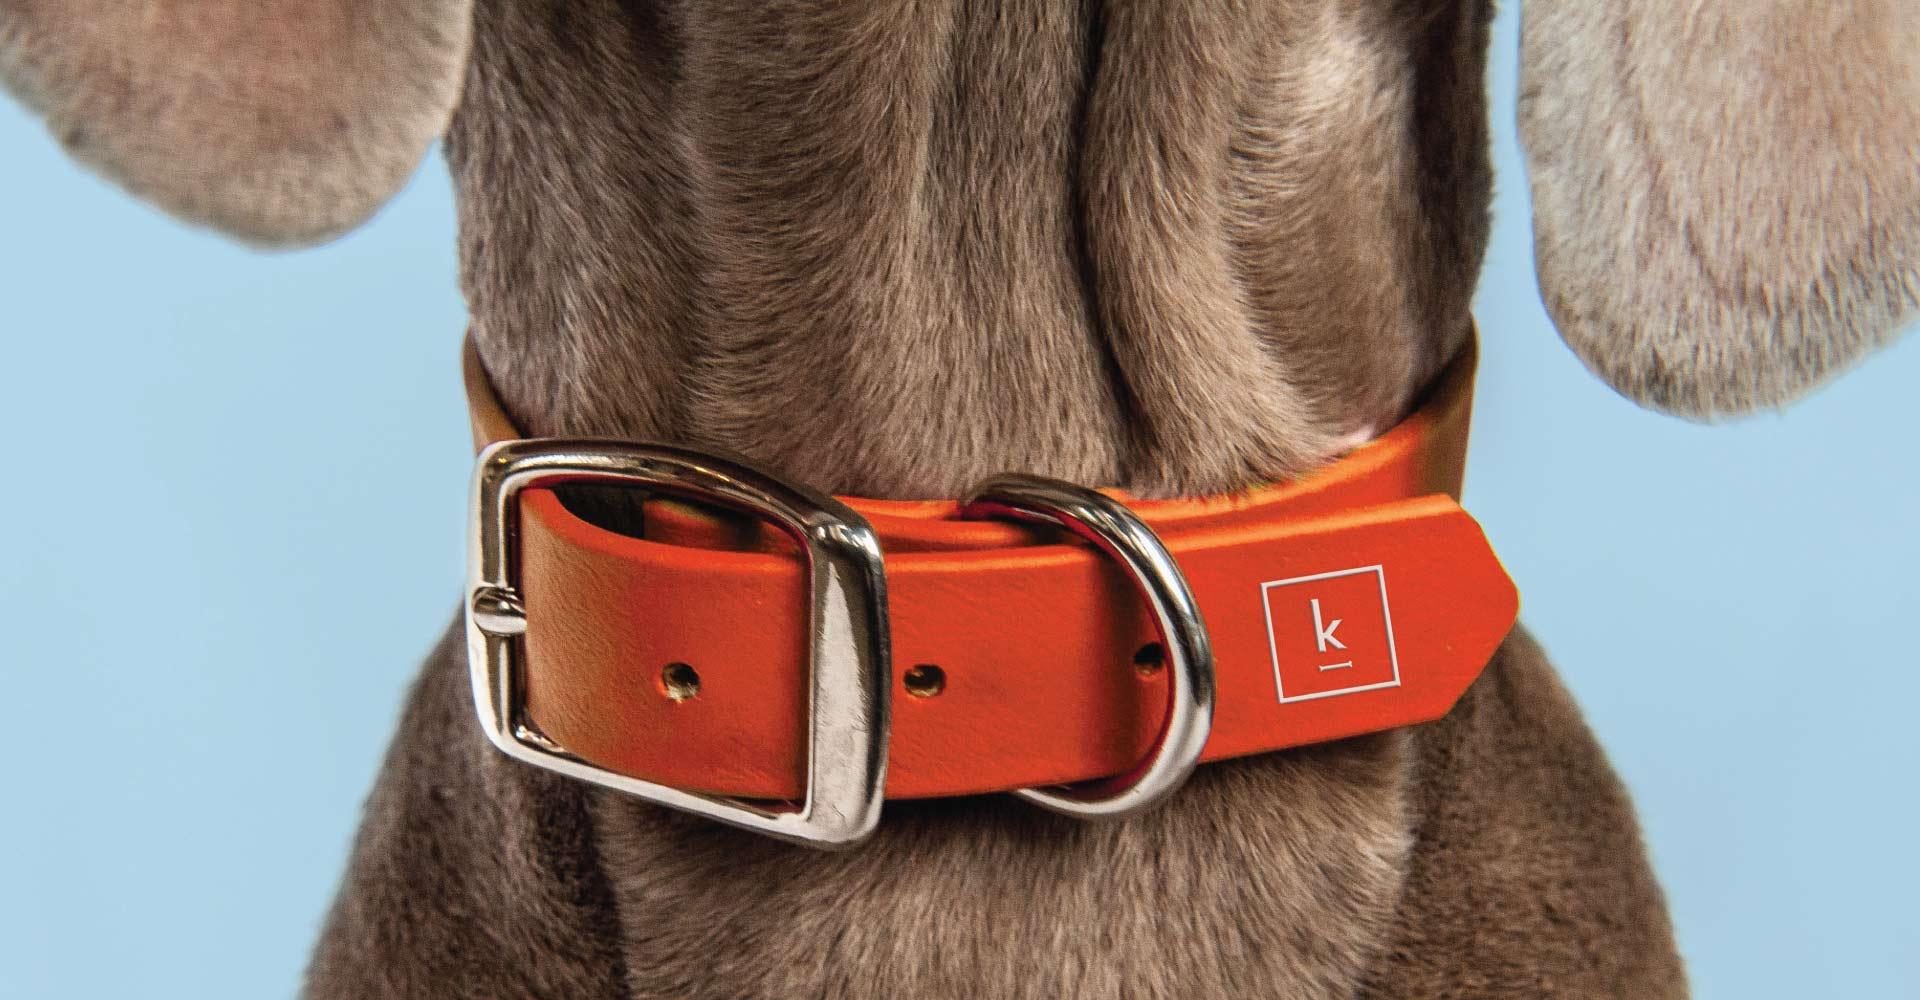 Creative_Retail_Packaging_Branding_Identity_Design_Klementime_03.jpg